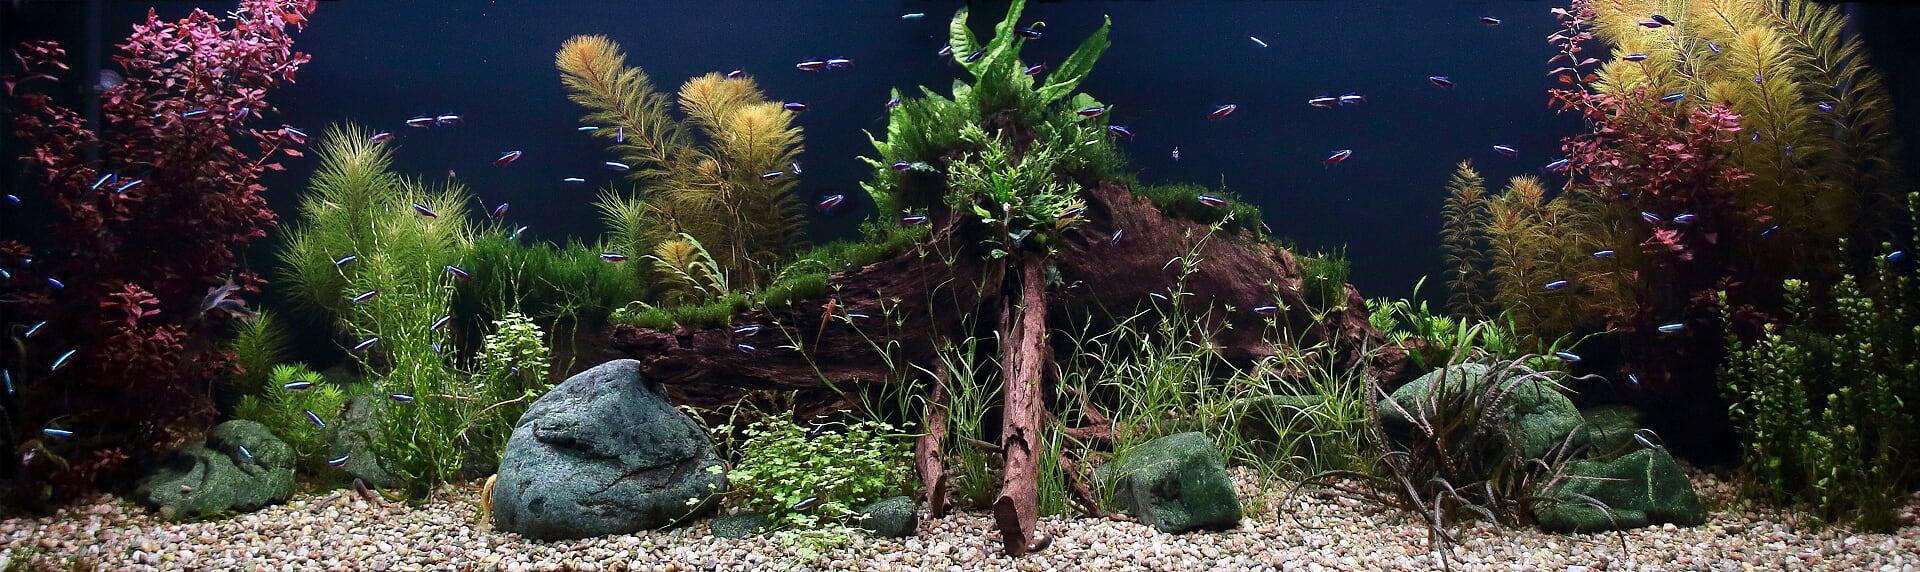 Akvárium na míru 600 litrů